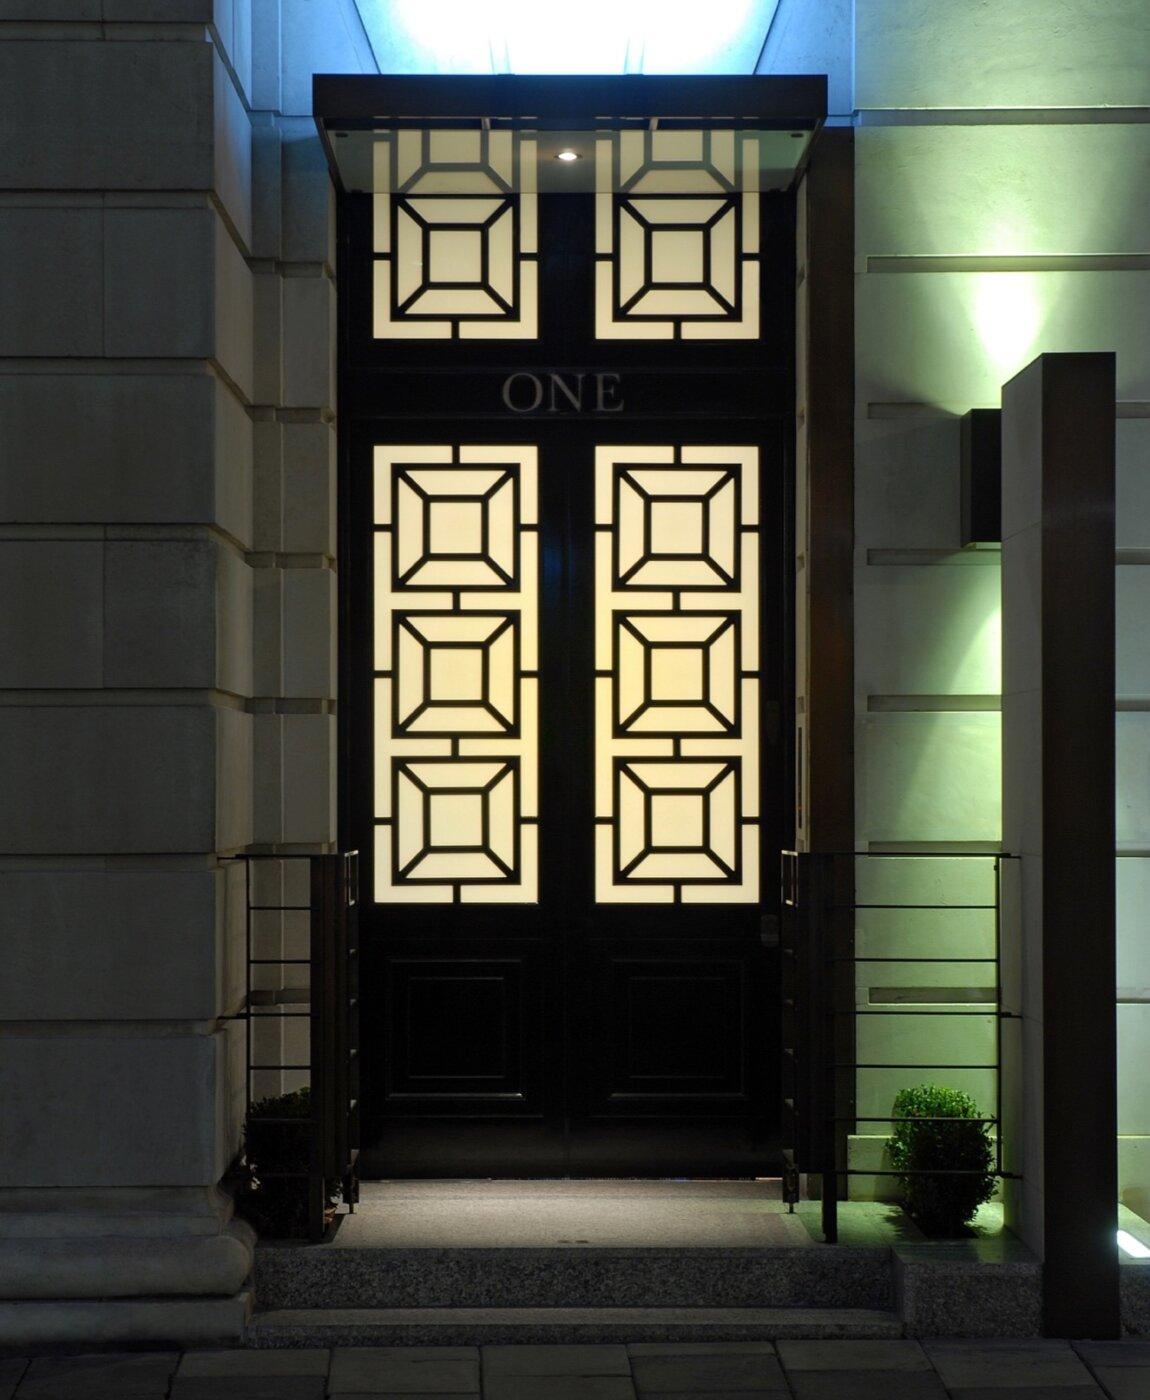 Stratton House, 5 Stratton Street, W1